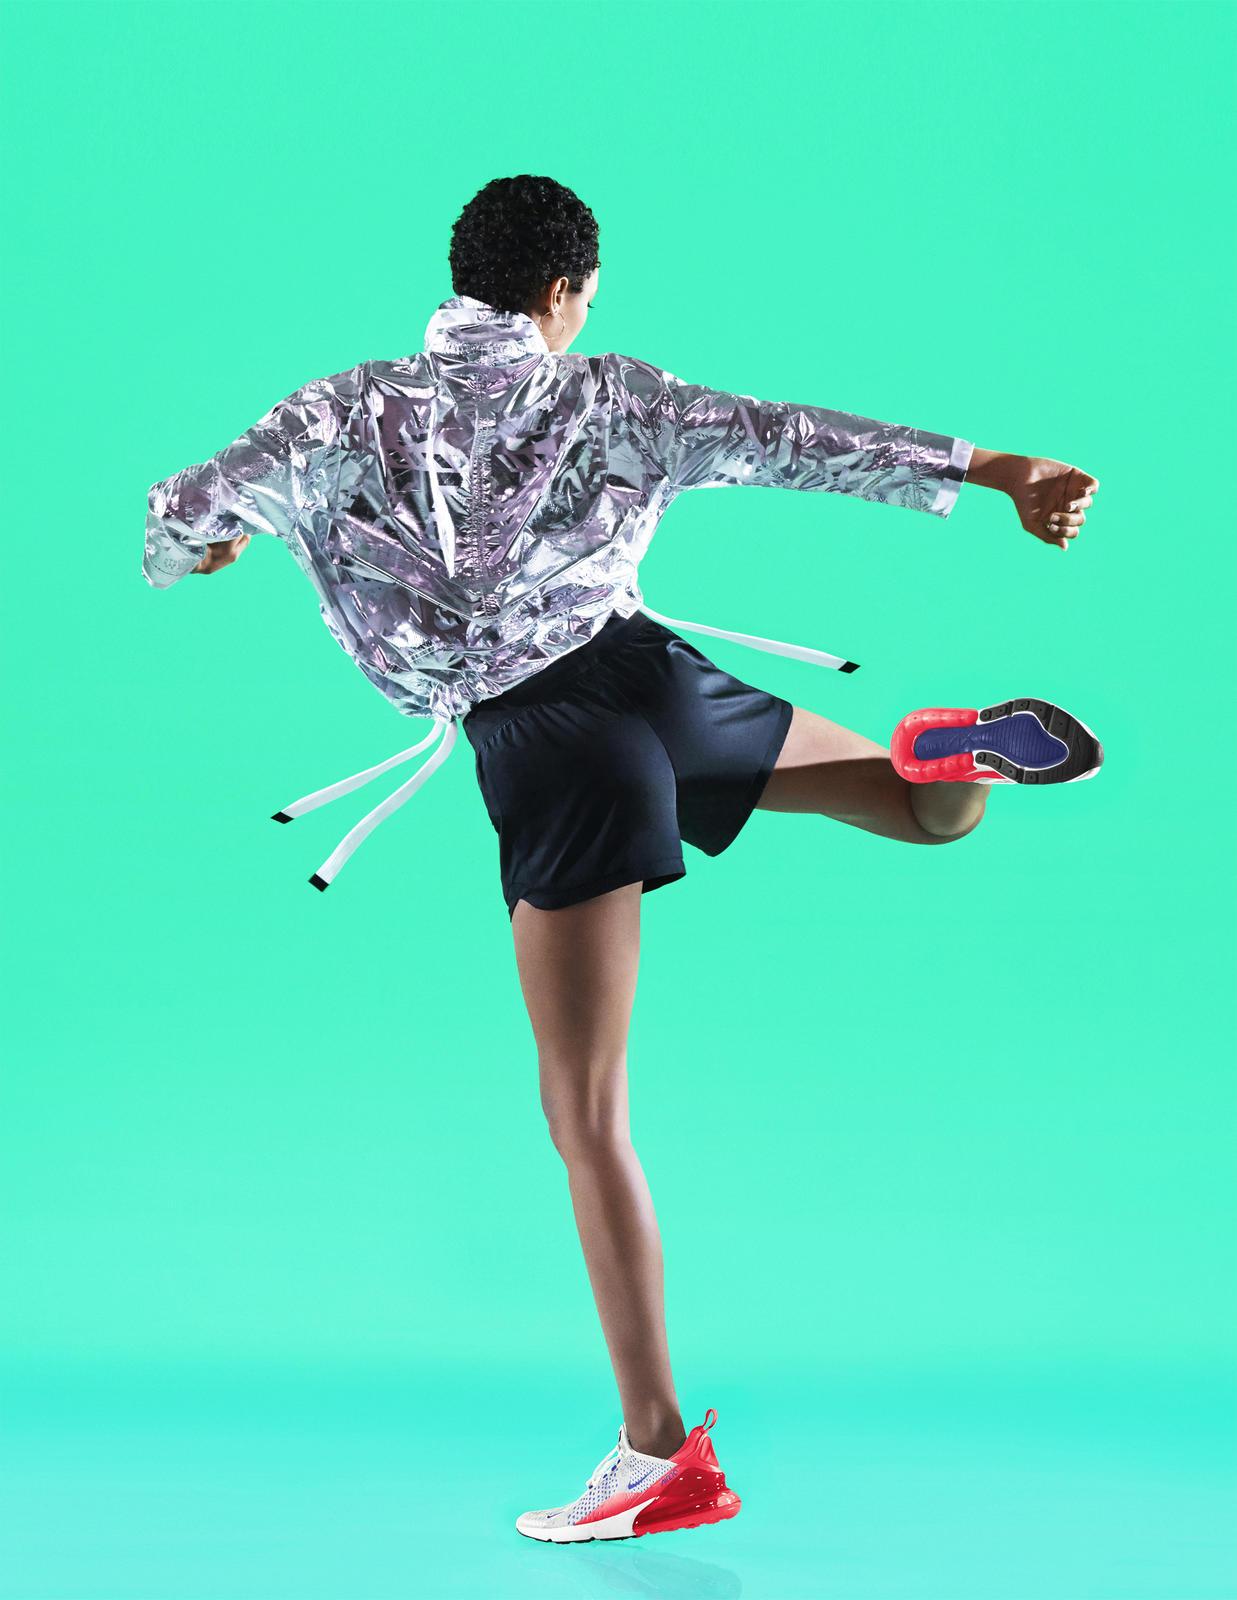 Nike Sportswear Spring 2018 Apparel and Footwear Lookbook